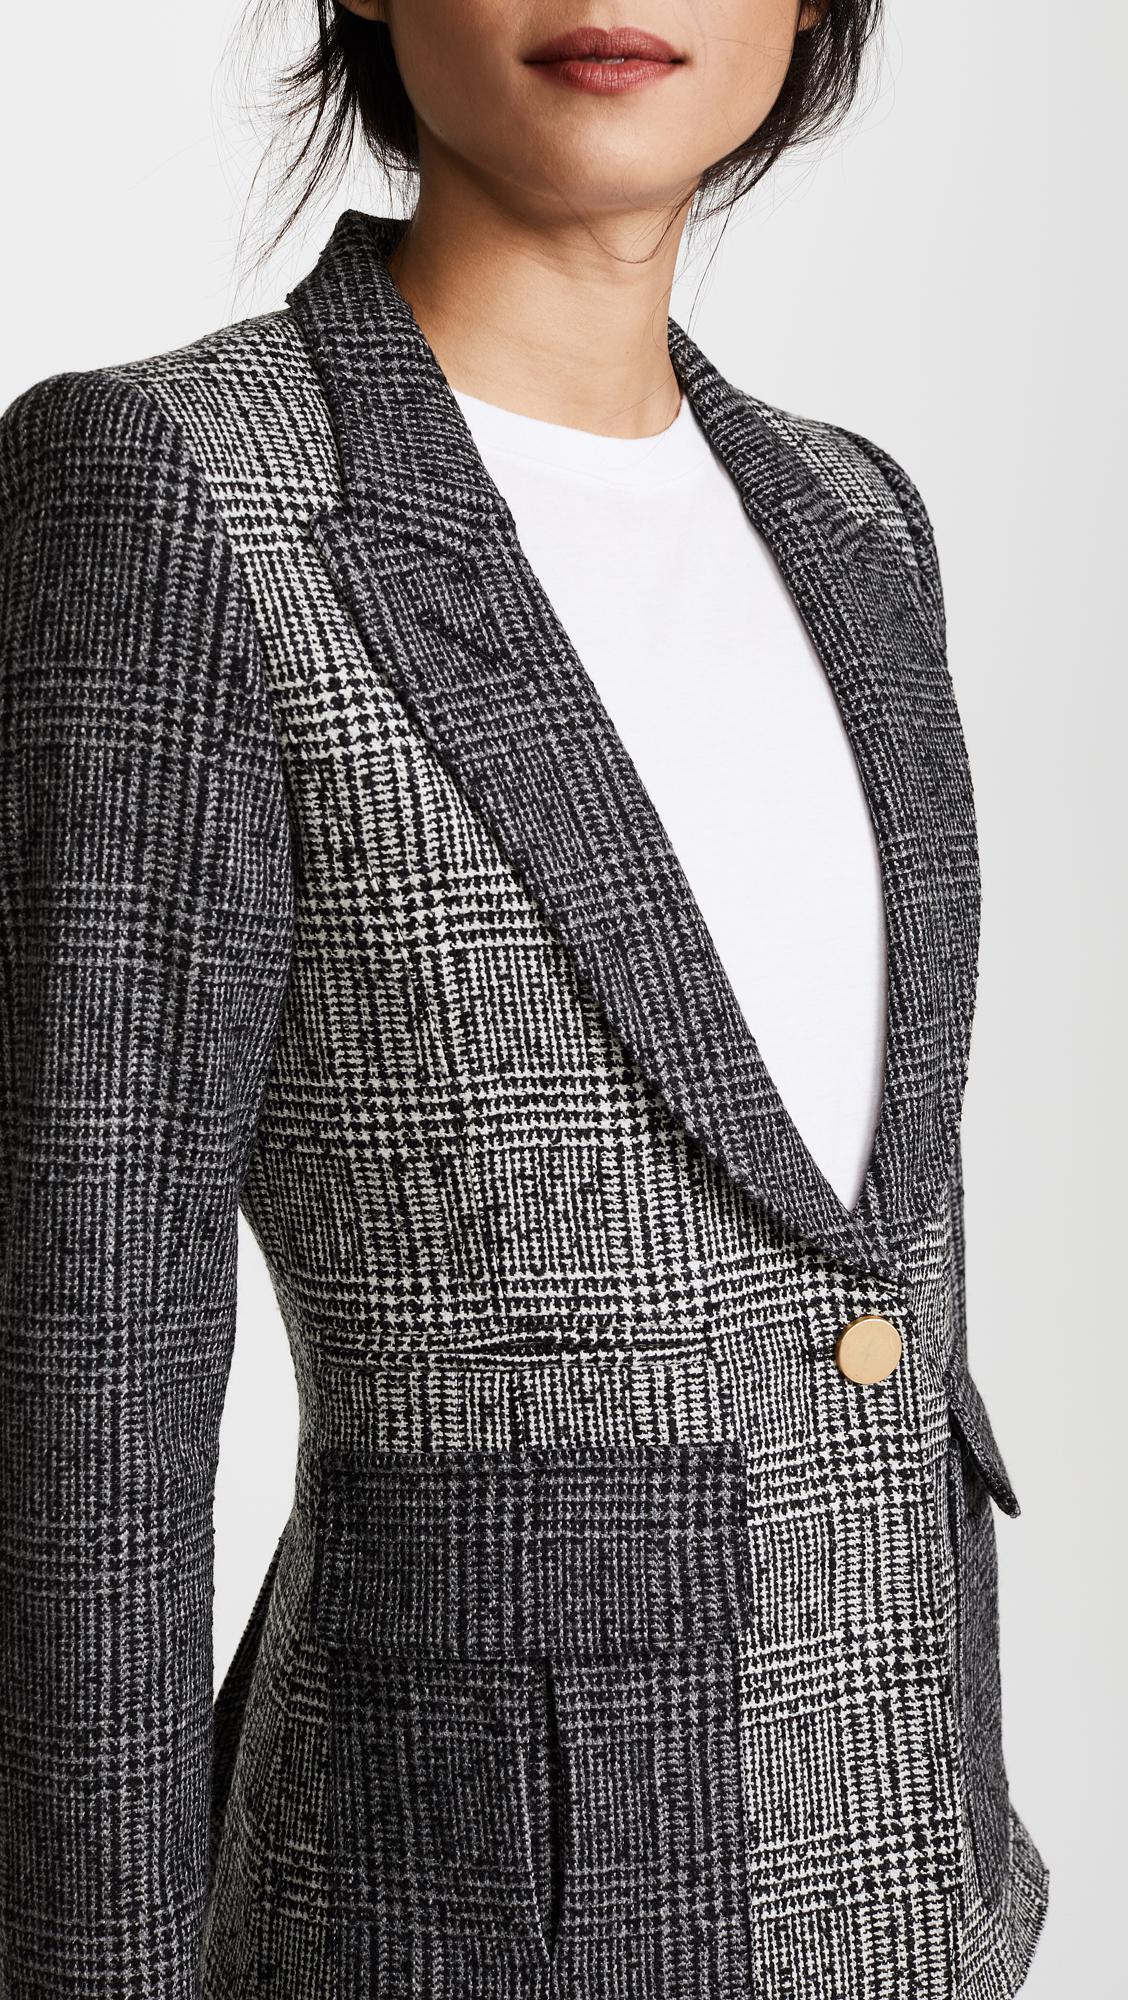 Smythe Wool Mixed Plaid Peaked Lapel Blazer in Grey